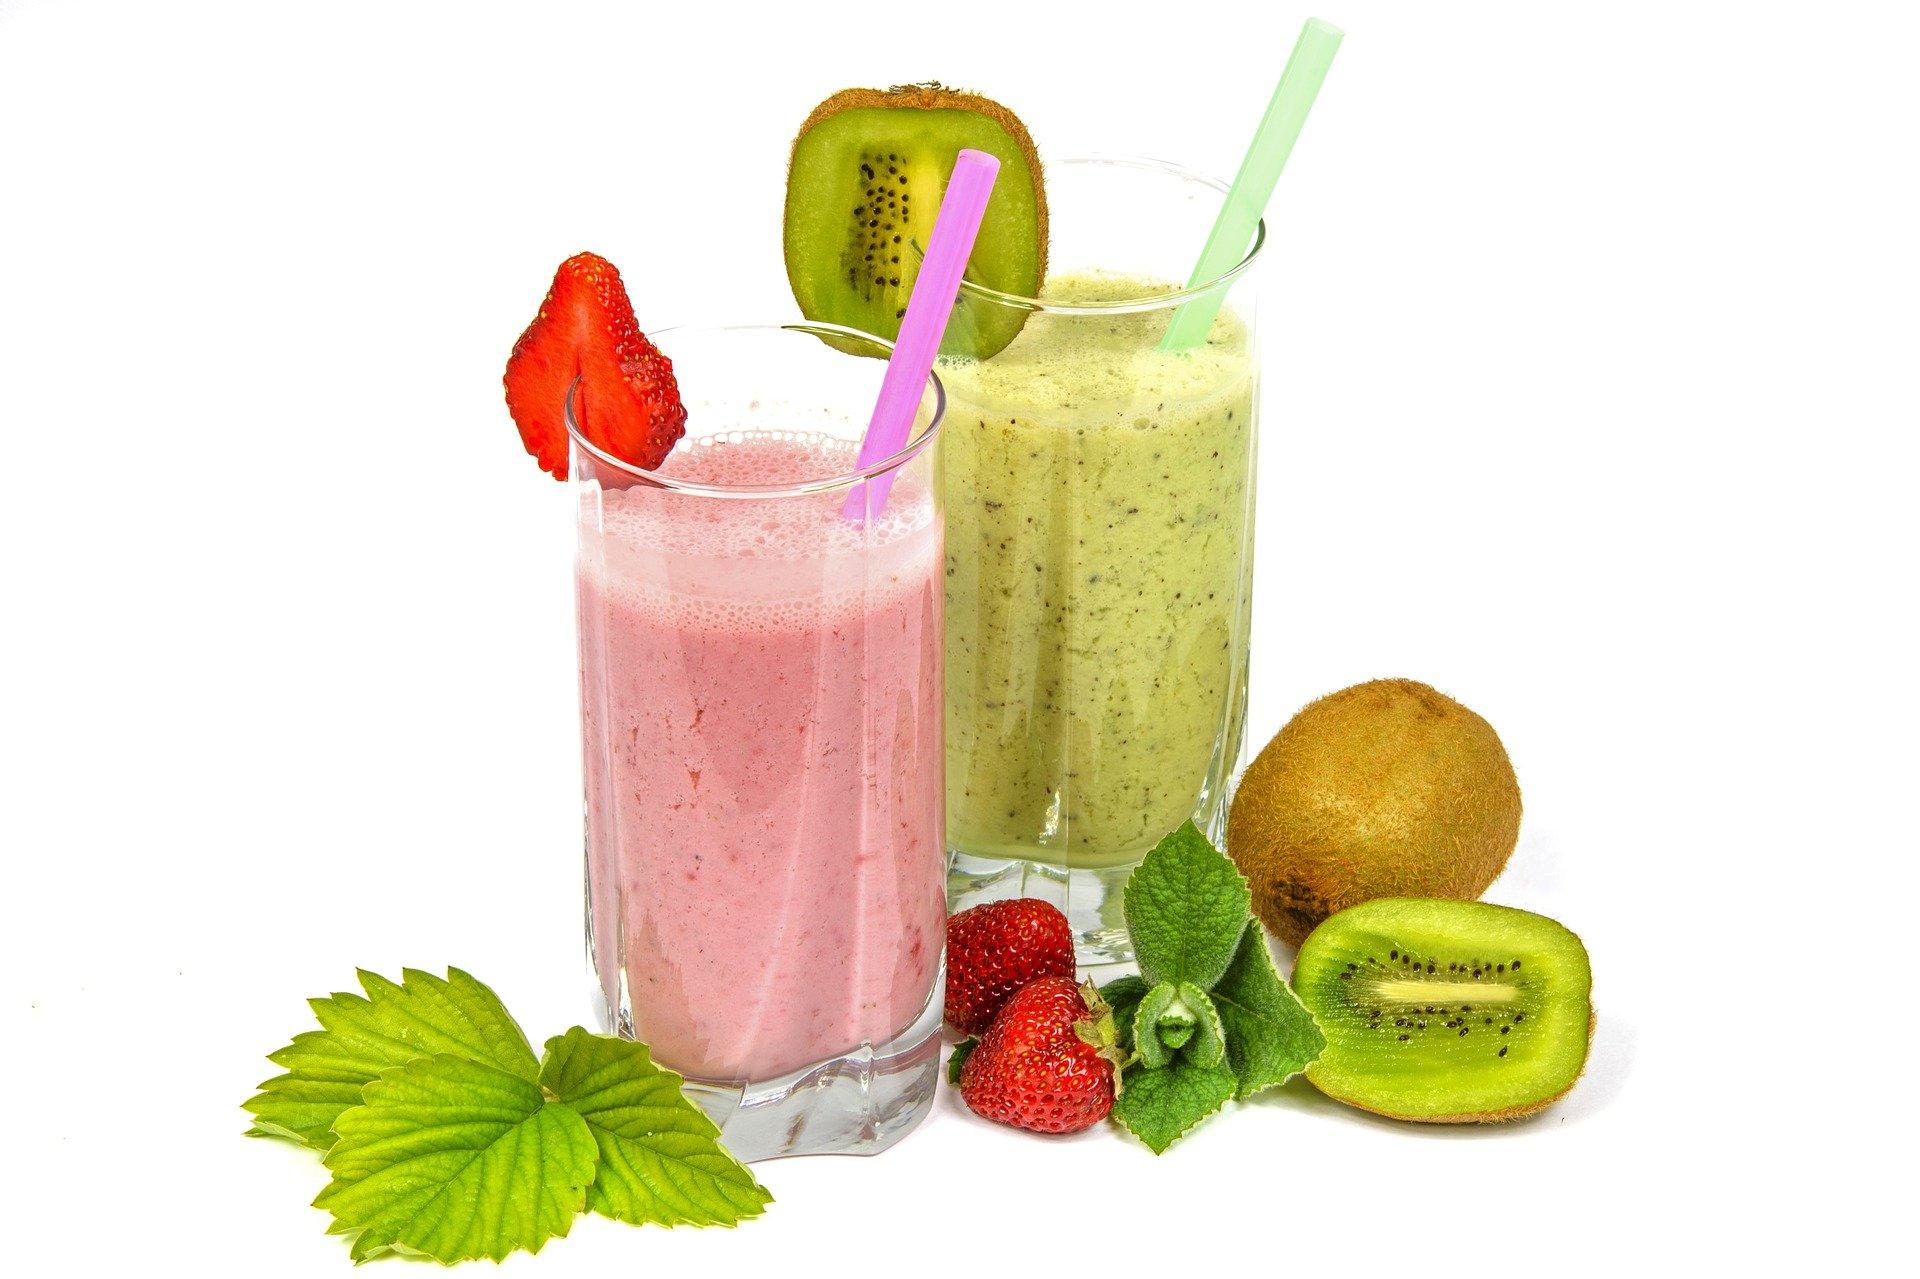 Bio Energie Drink - Kaufideen. Beste Bio Energie Drinks finden